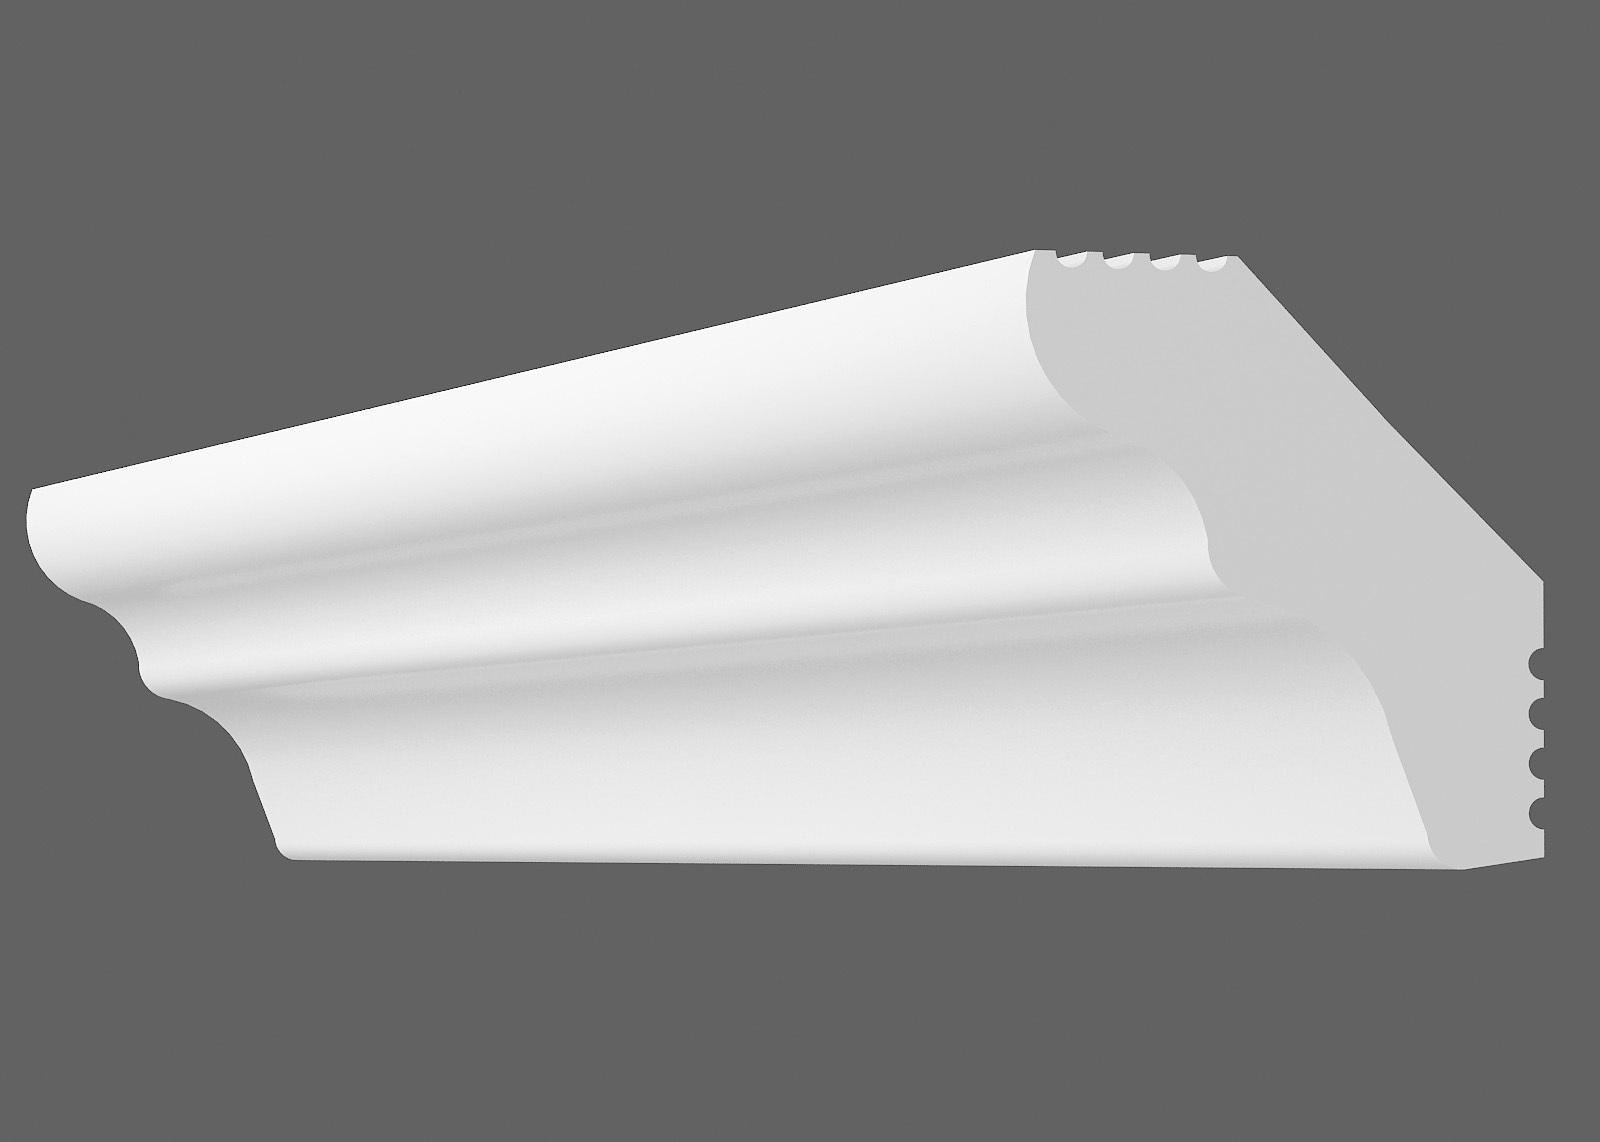 Потолочный плинтус E-25 (Размер:15х25мм)